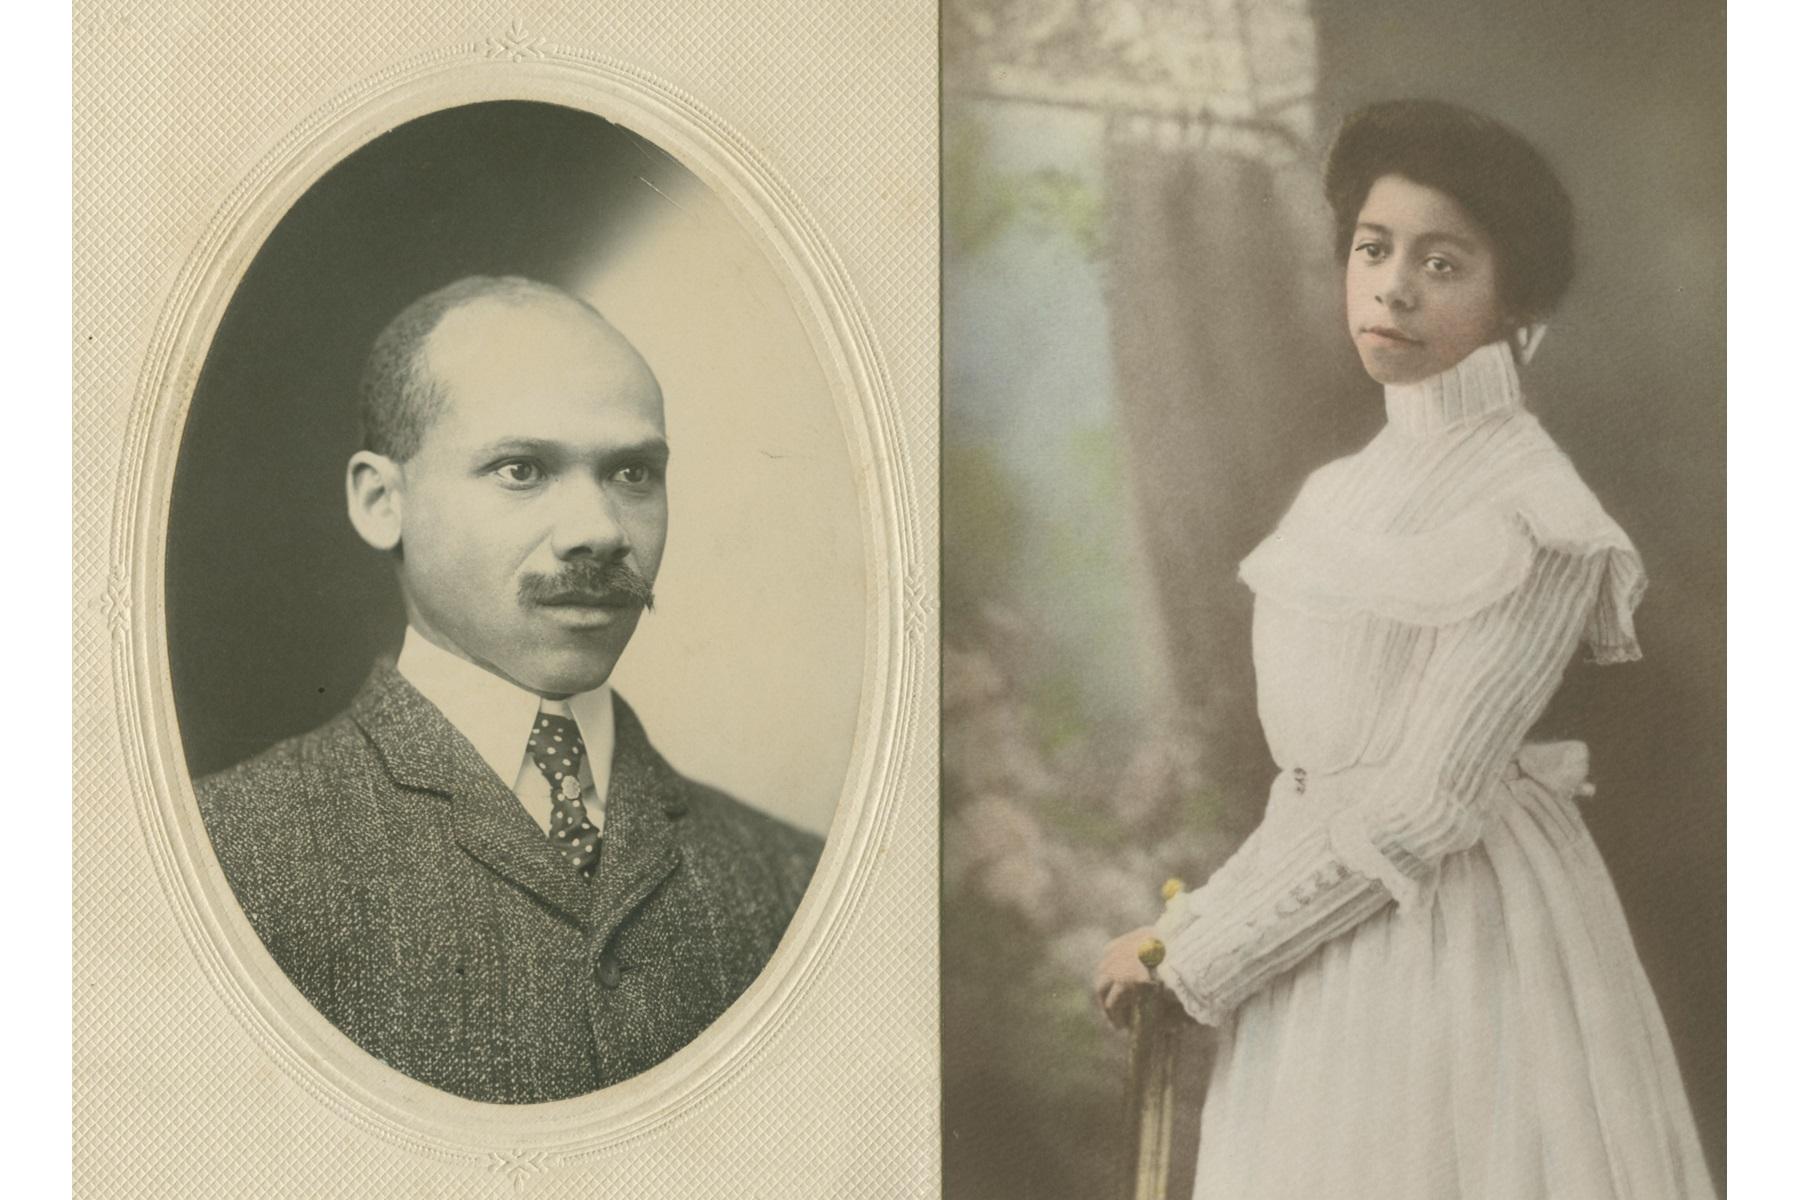 John and Freida Kenney